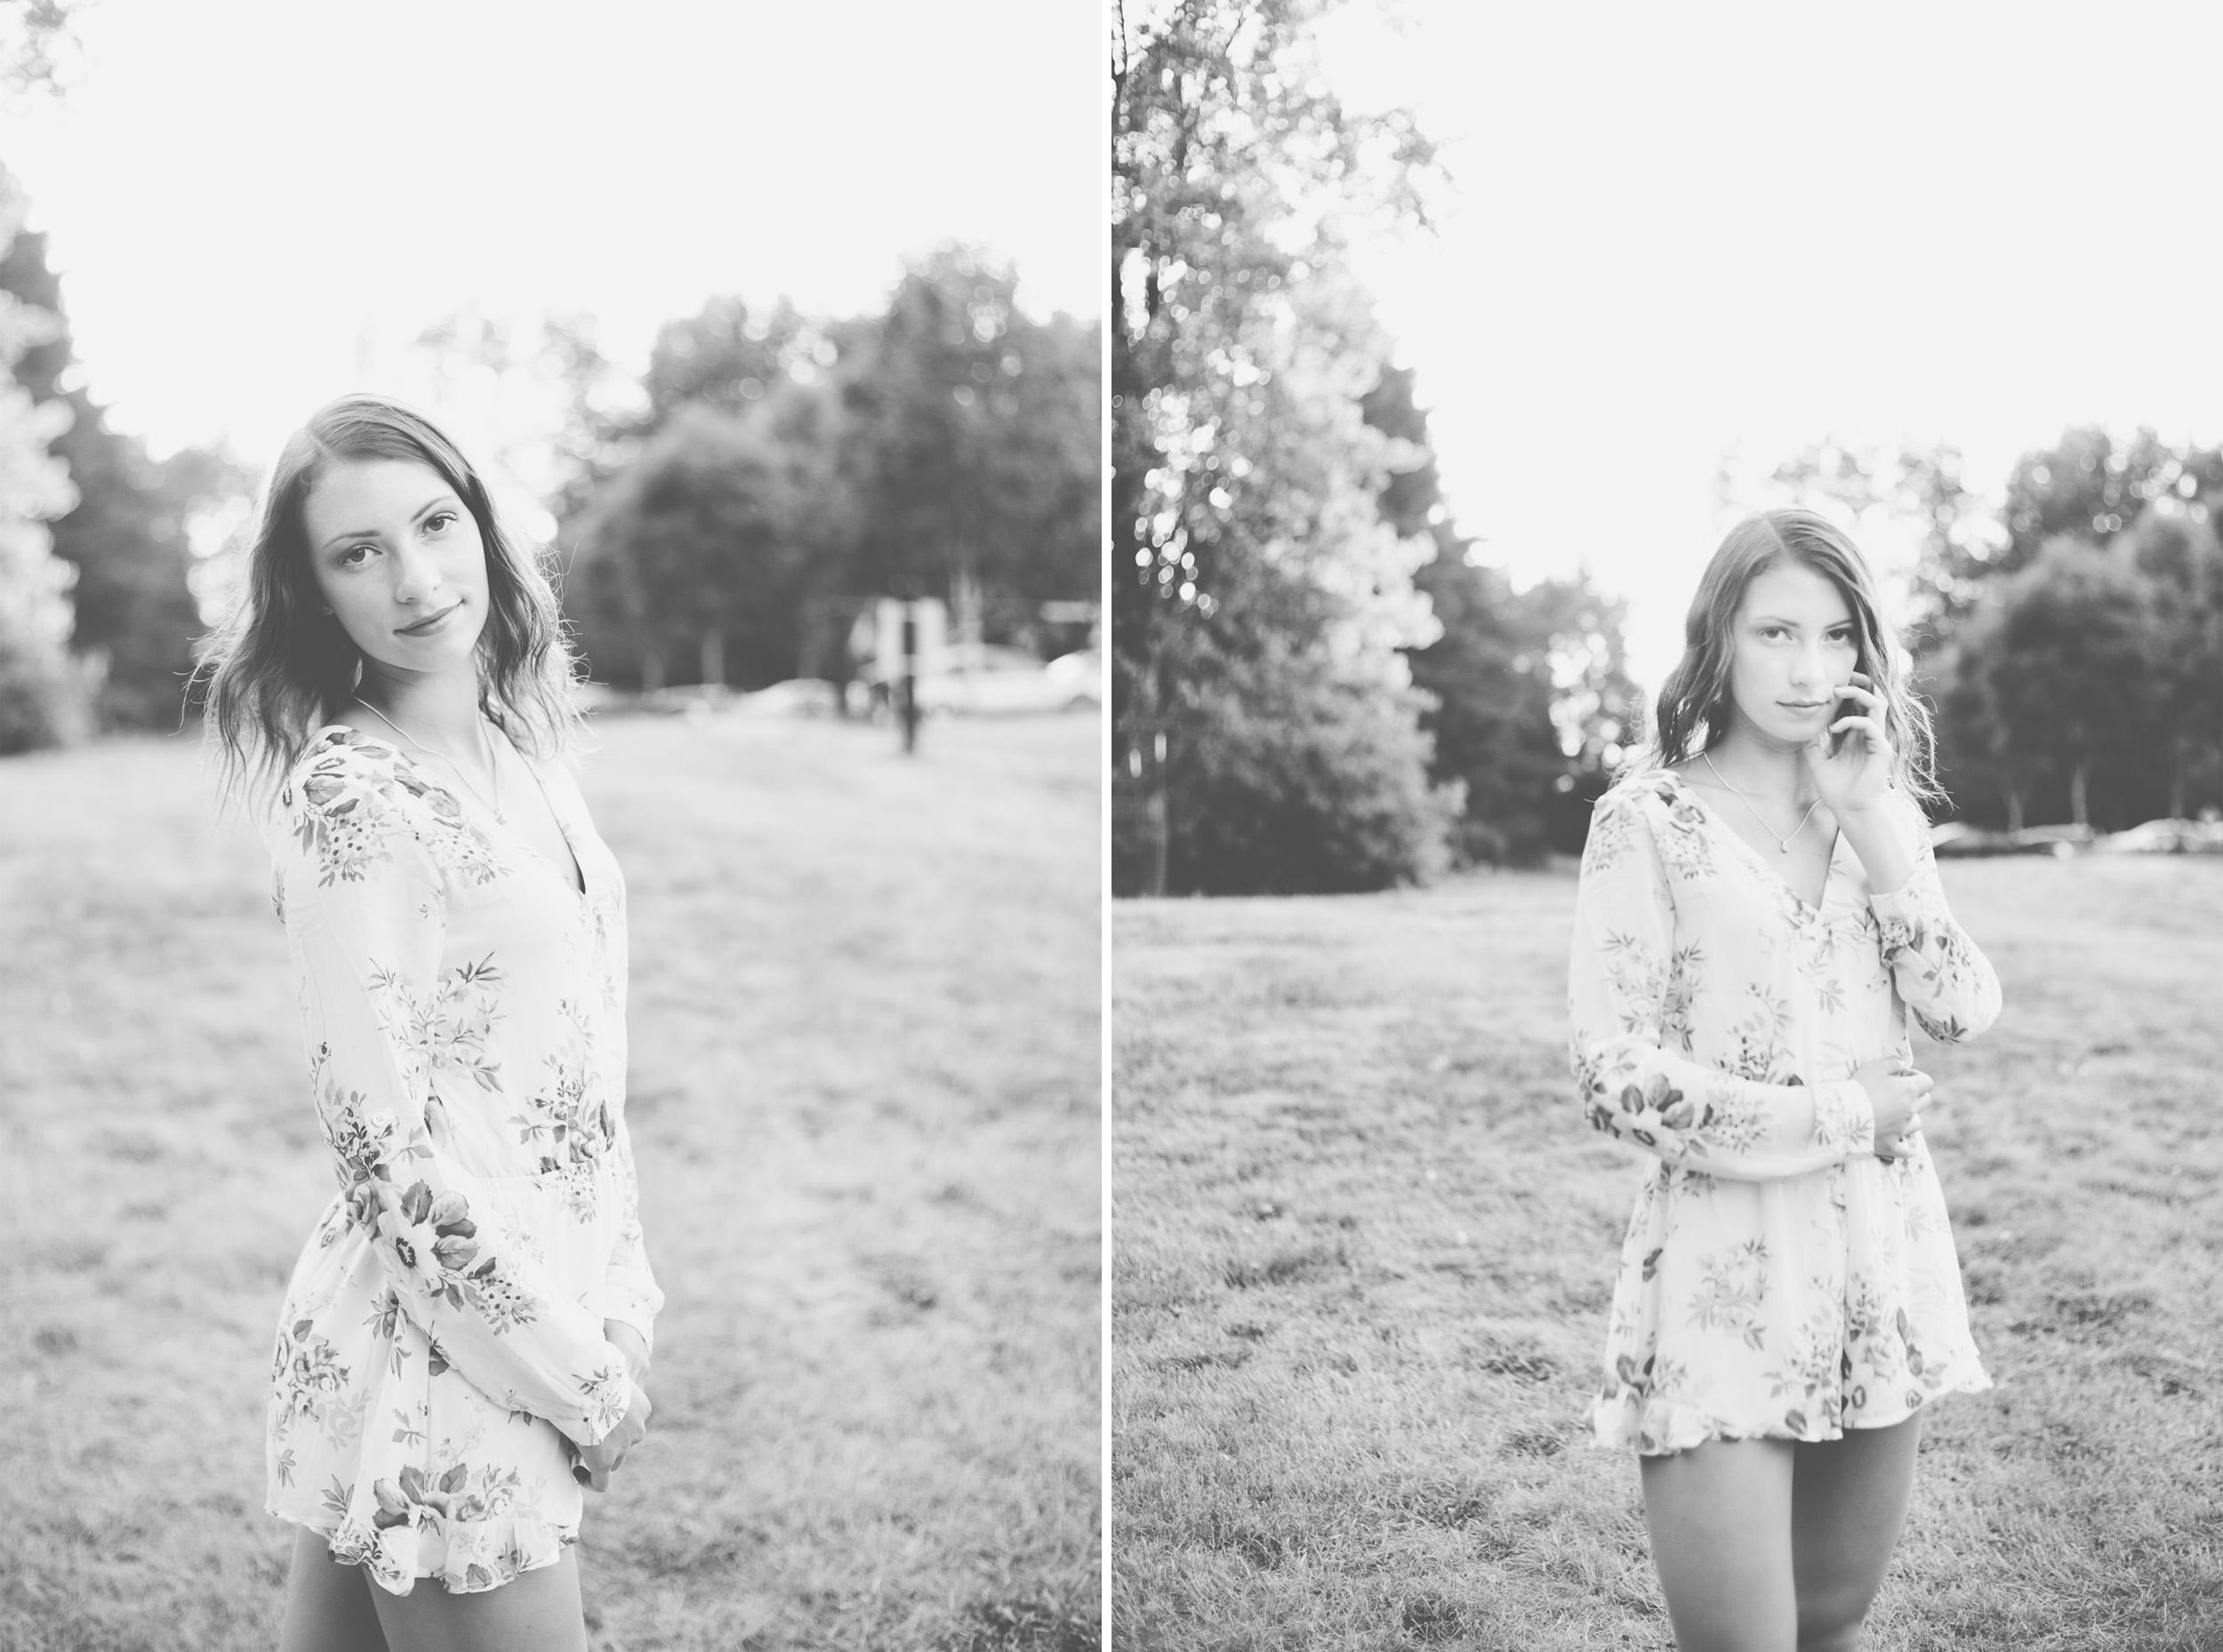 Whitney Petretto Photography | Family & Senior Photos | Stace, Marri & Koby | Wilsonville, OR